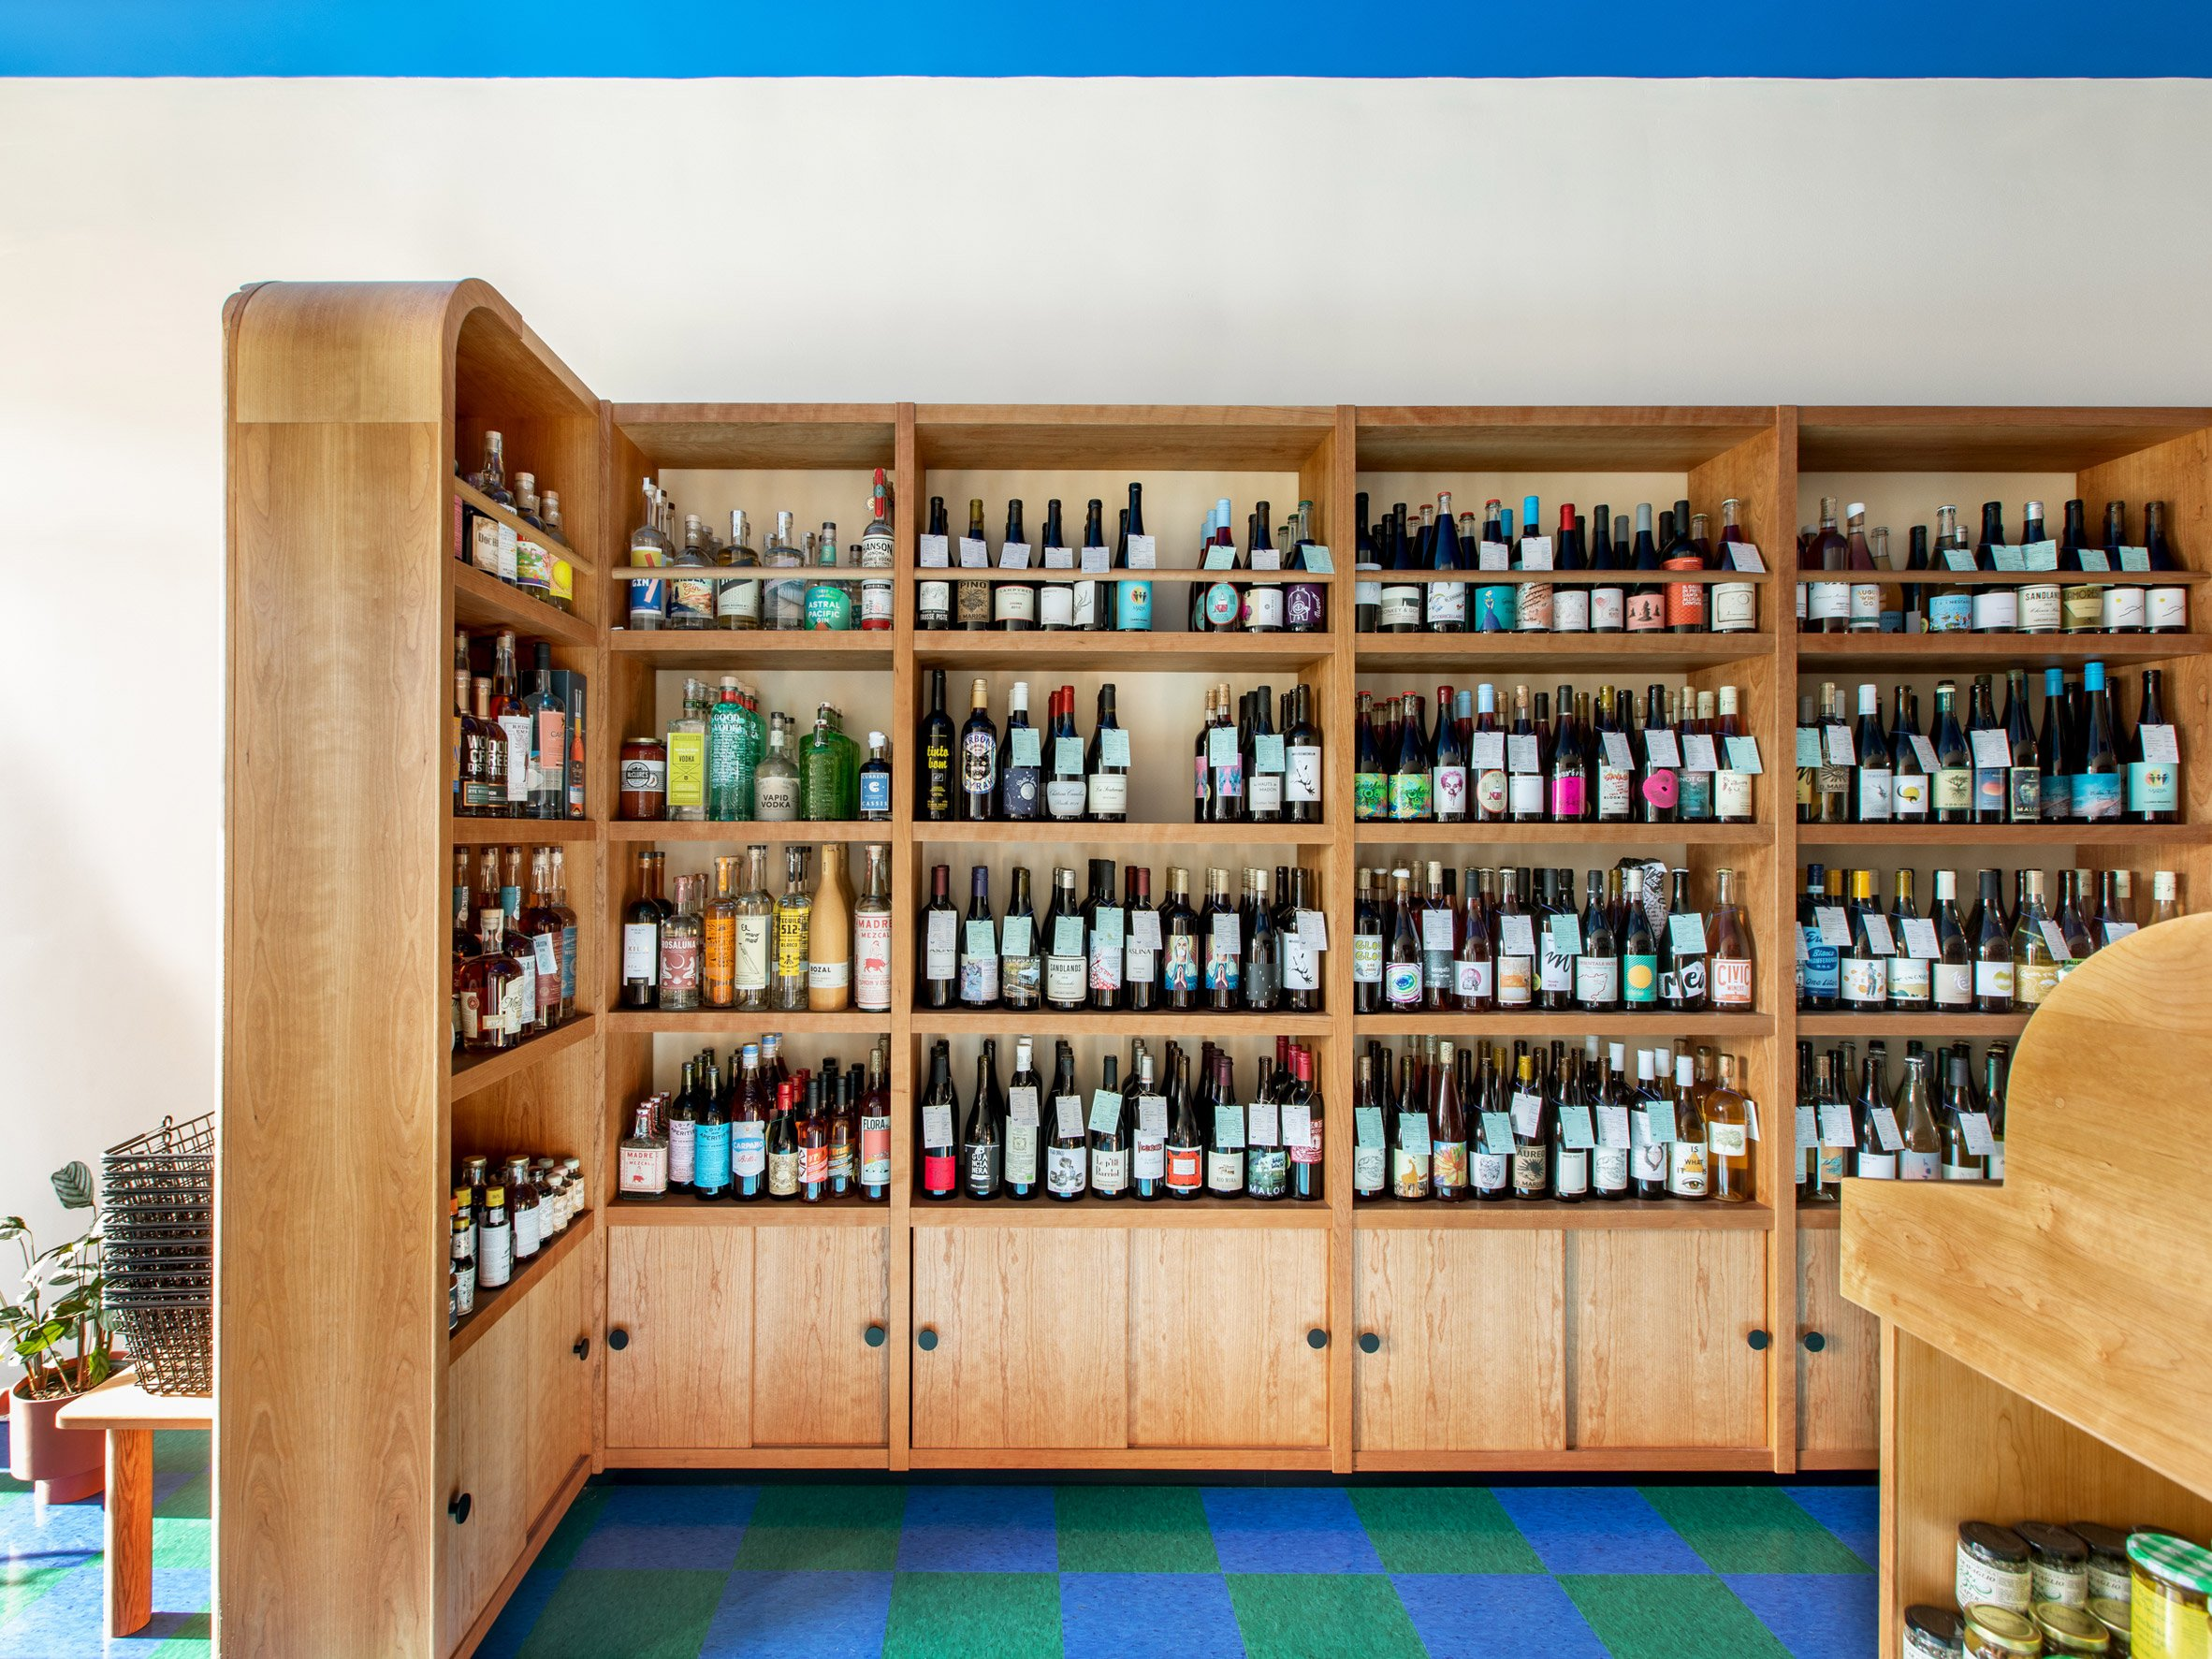 Shelves designed by Adi Goodrich in cherry wood